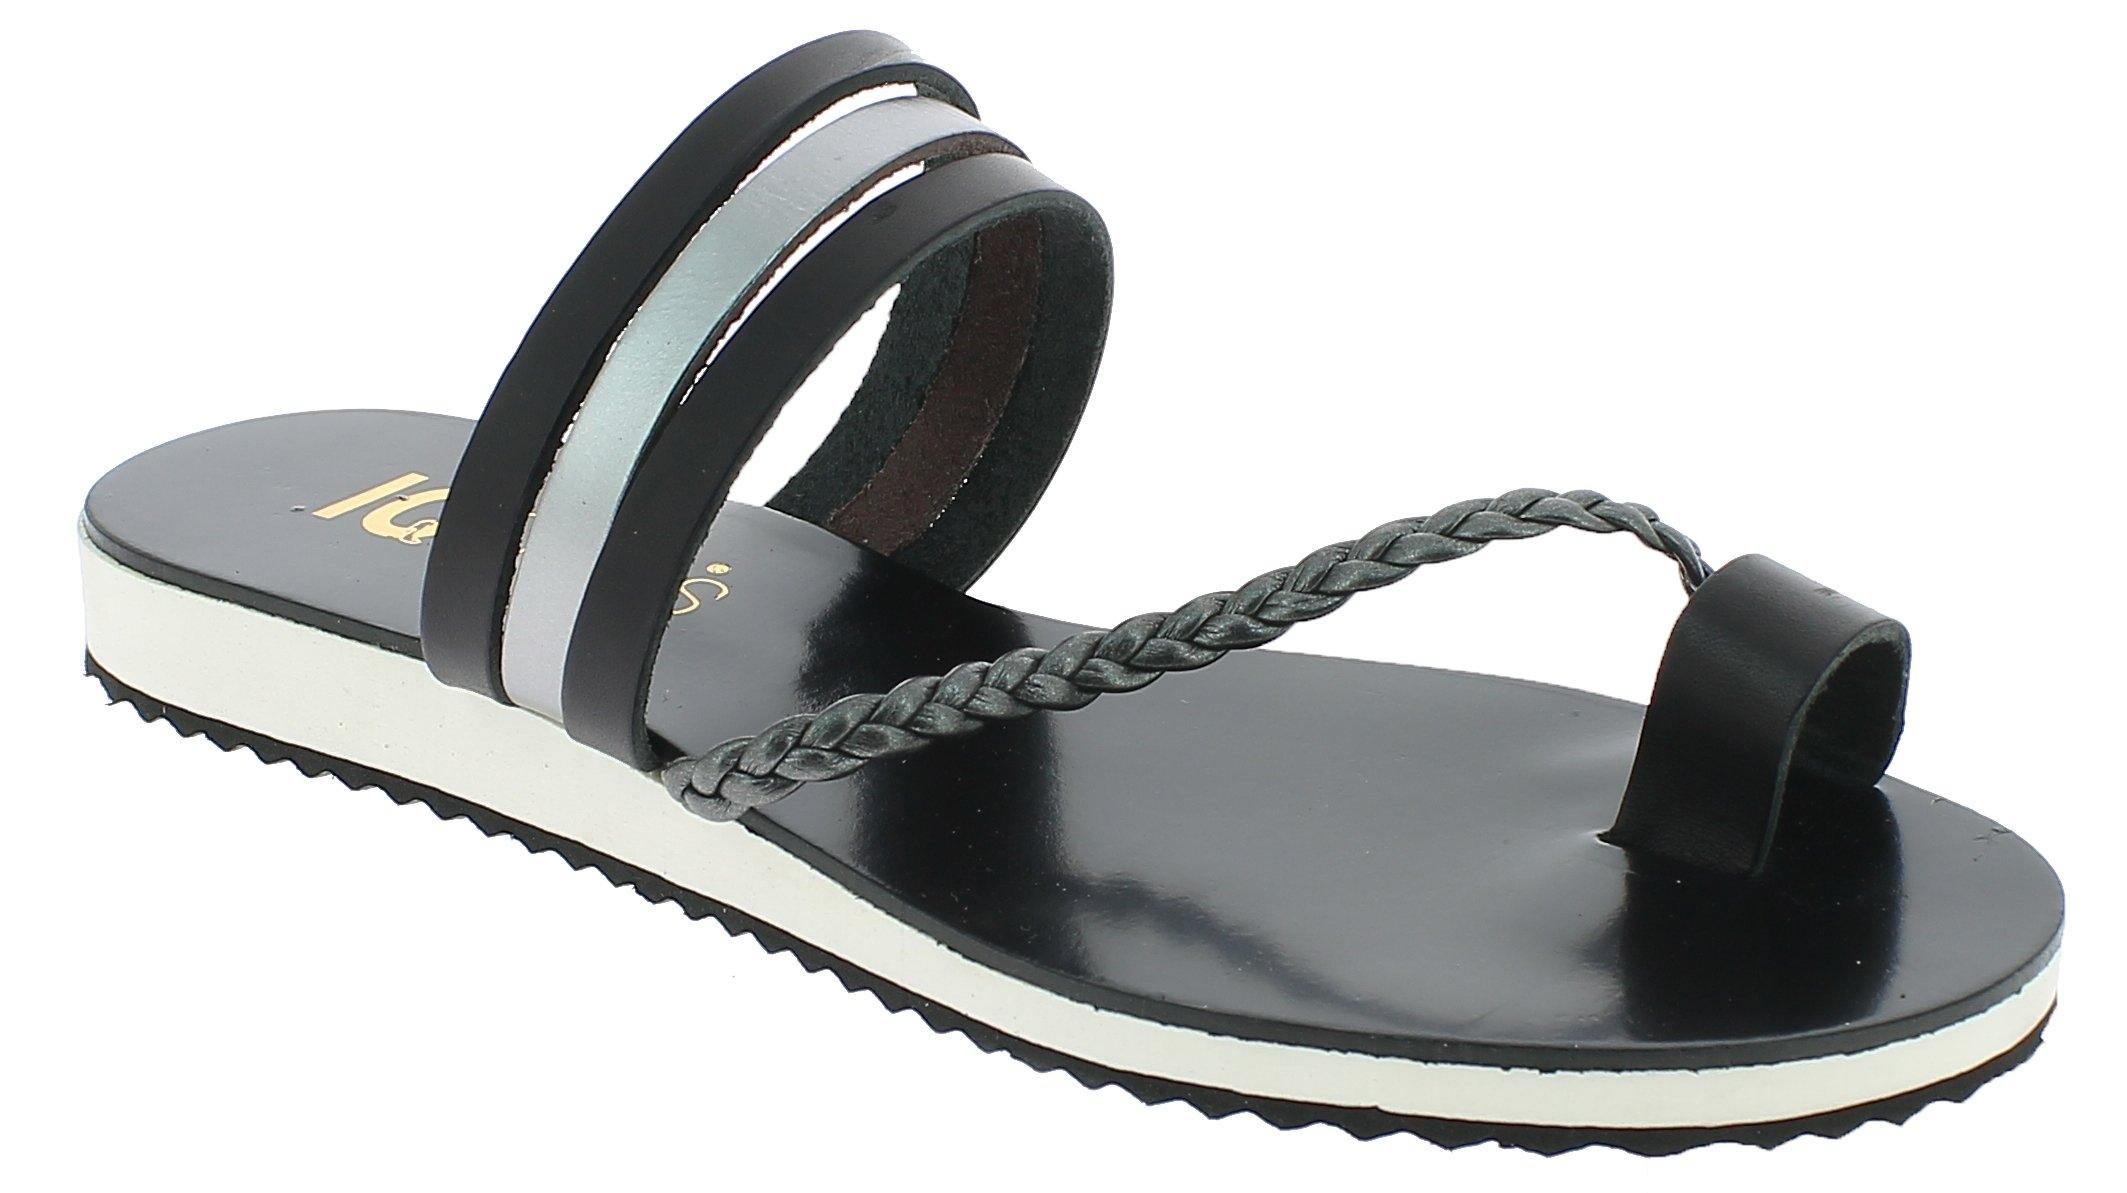 IQSHOES Γυναικεία Σανδάλια 211 Μαύρο - IqShoes - 211 BLACK-IQSHOES-black-36/1/15 παπούτσια  προσφορεσ